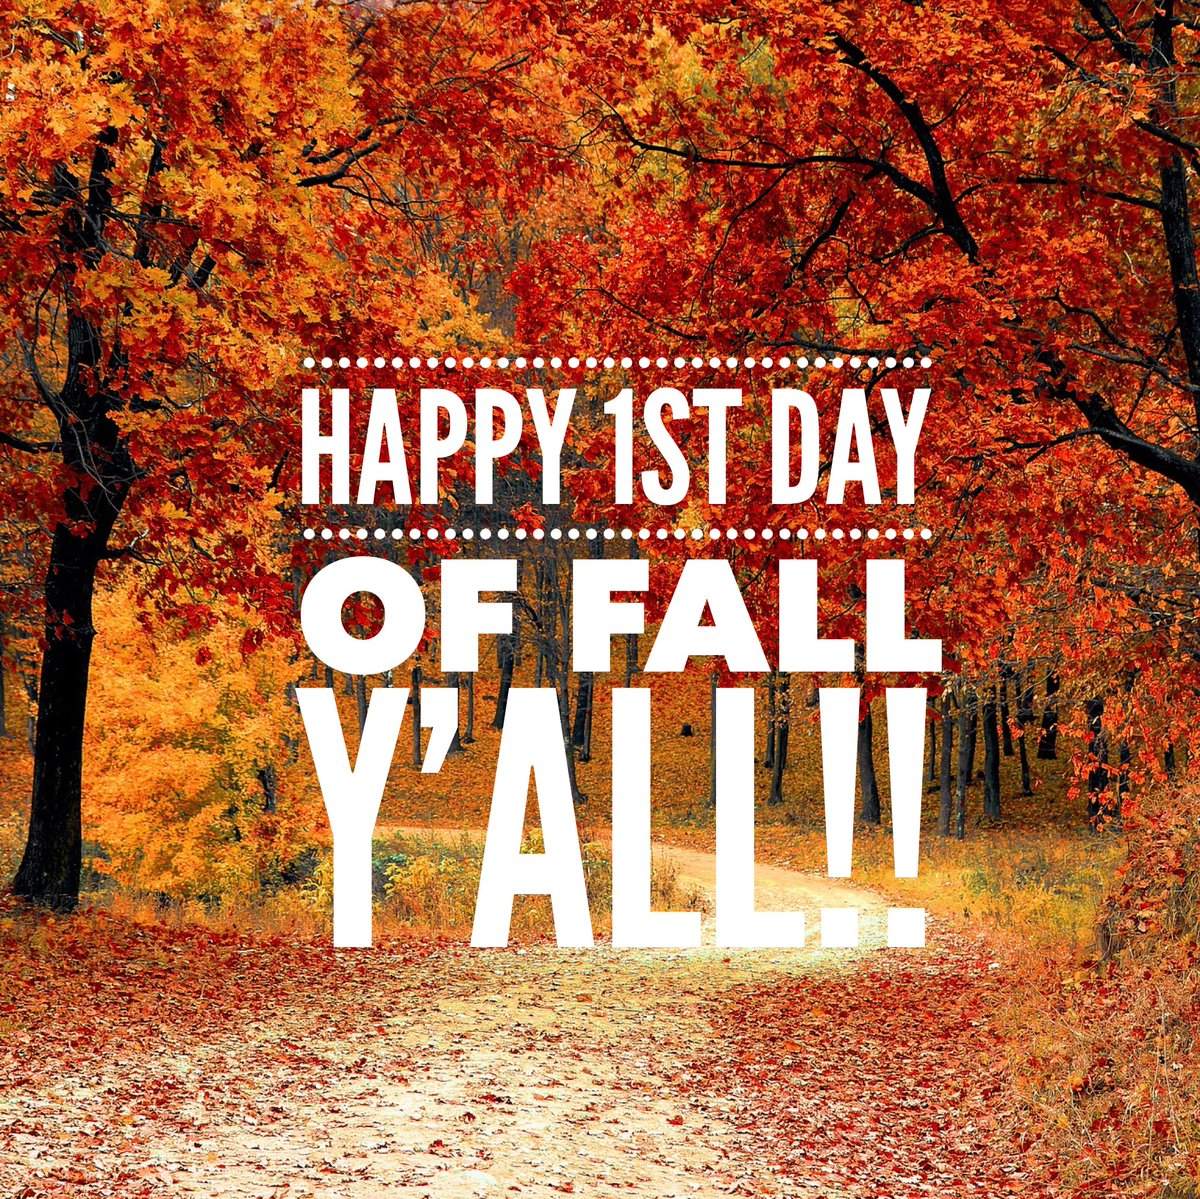 Happy Fall Y'all #seasonschange #whoseready #colors #beautiful @lotboy101 @rayszhell @Lauren__Rose_ @Mrs_Calvert23 @Nightingirl81<br>http://pic.twitter.com/QGa01OMG1l